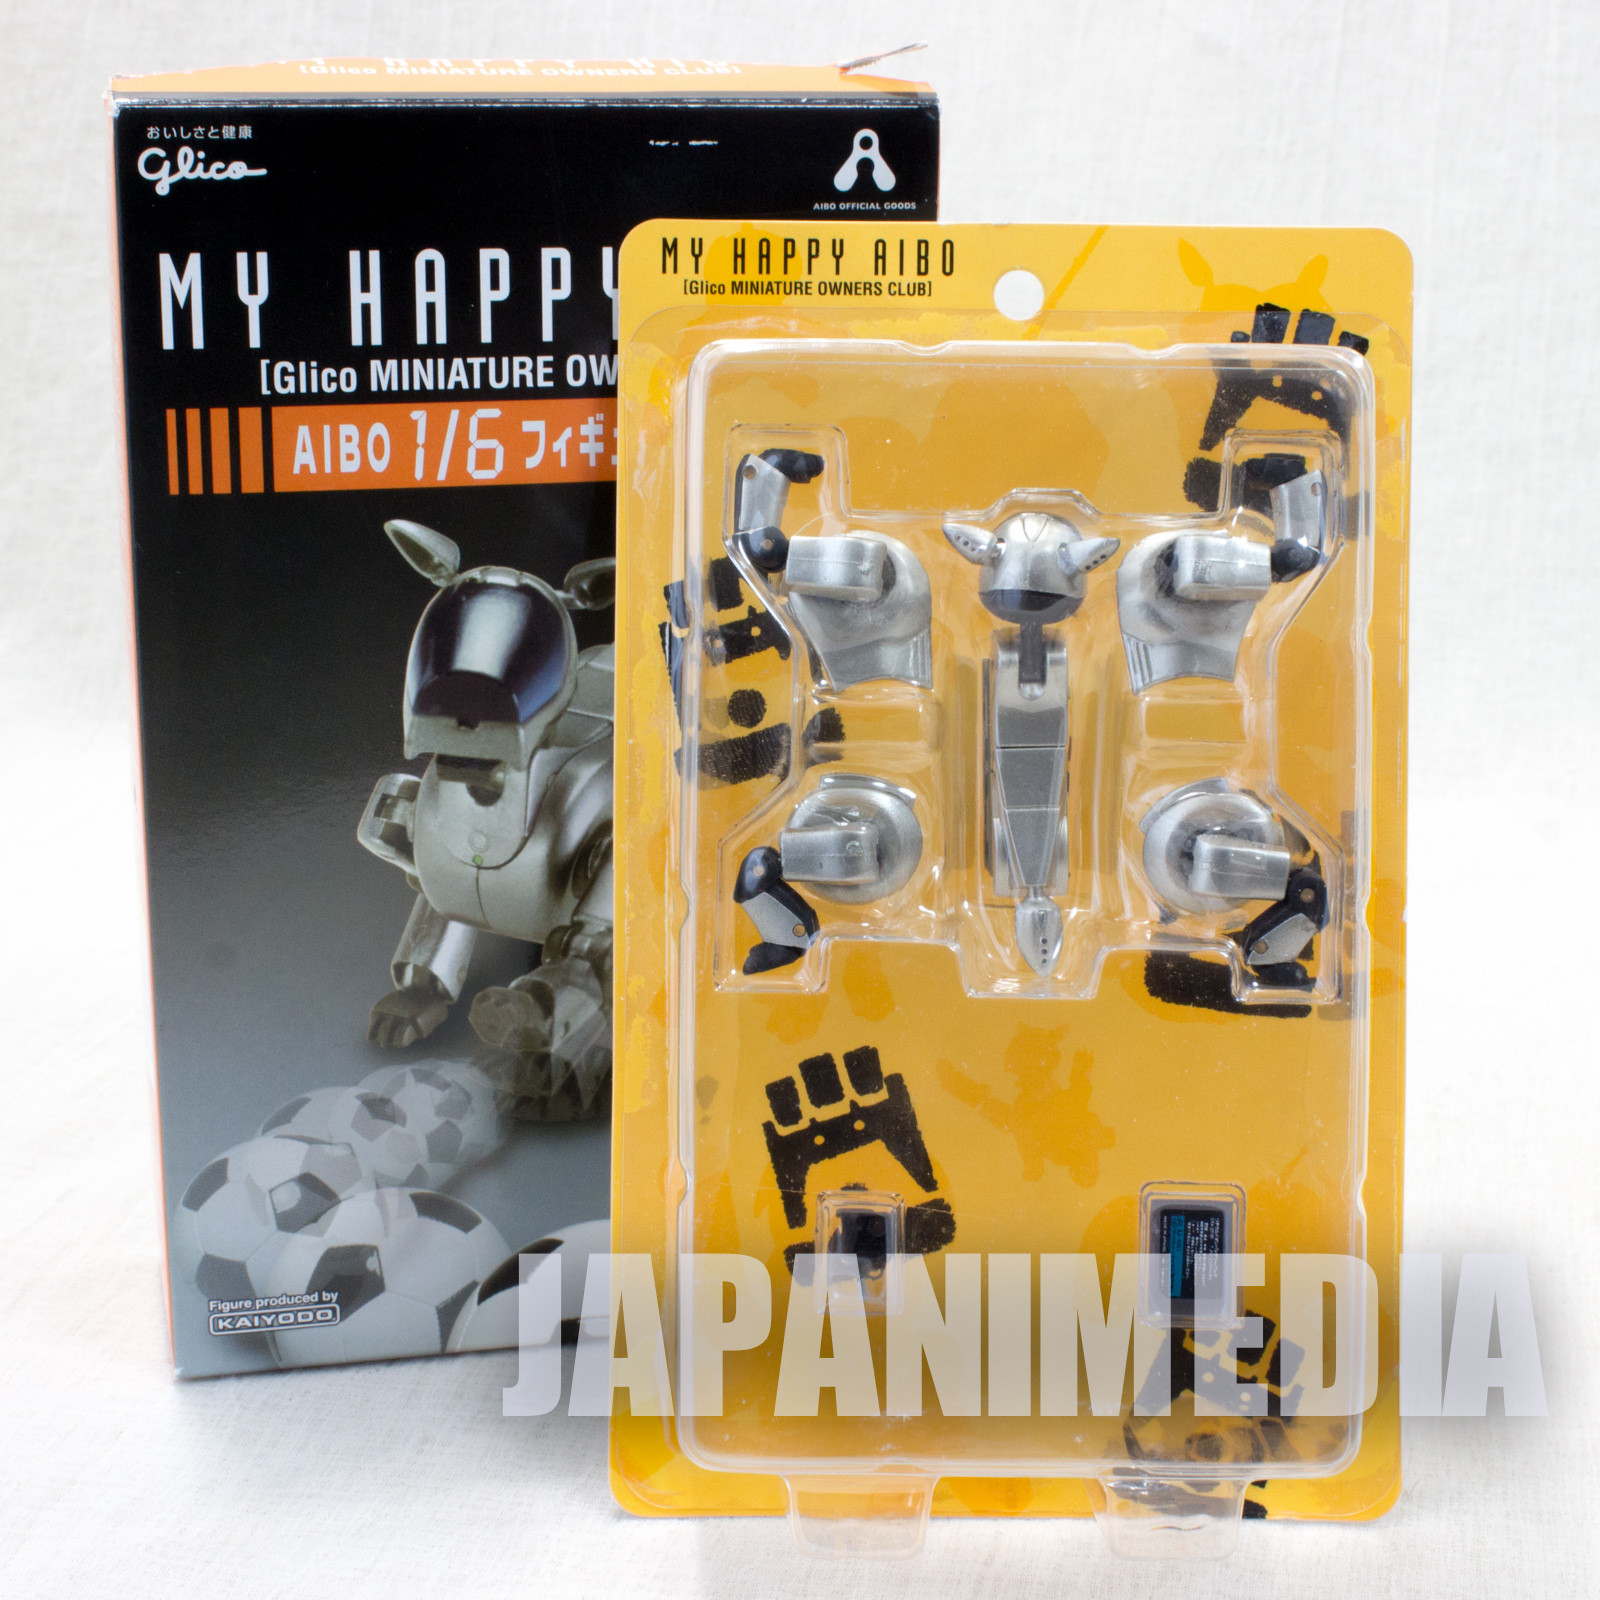 MY HAPPY AIBO ERS-210A Gold 1/6 Miniature Figure Kaiyodo Glico JAPAN SONY